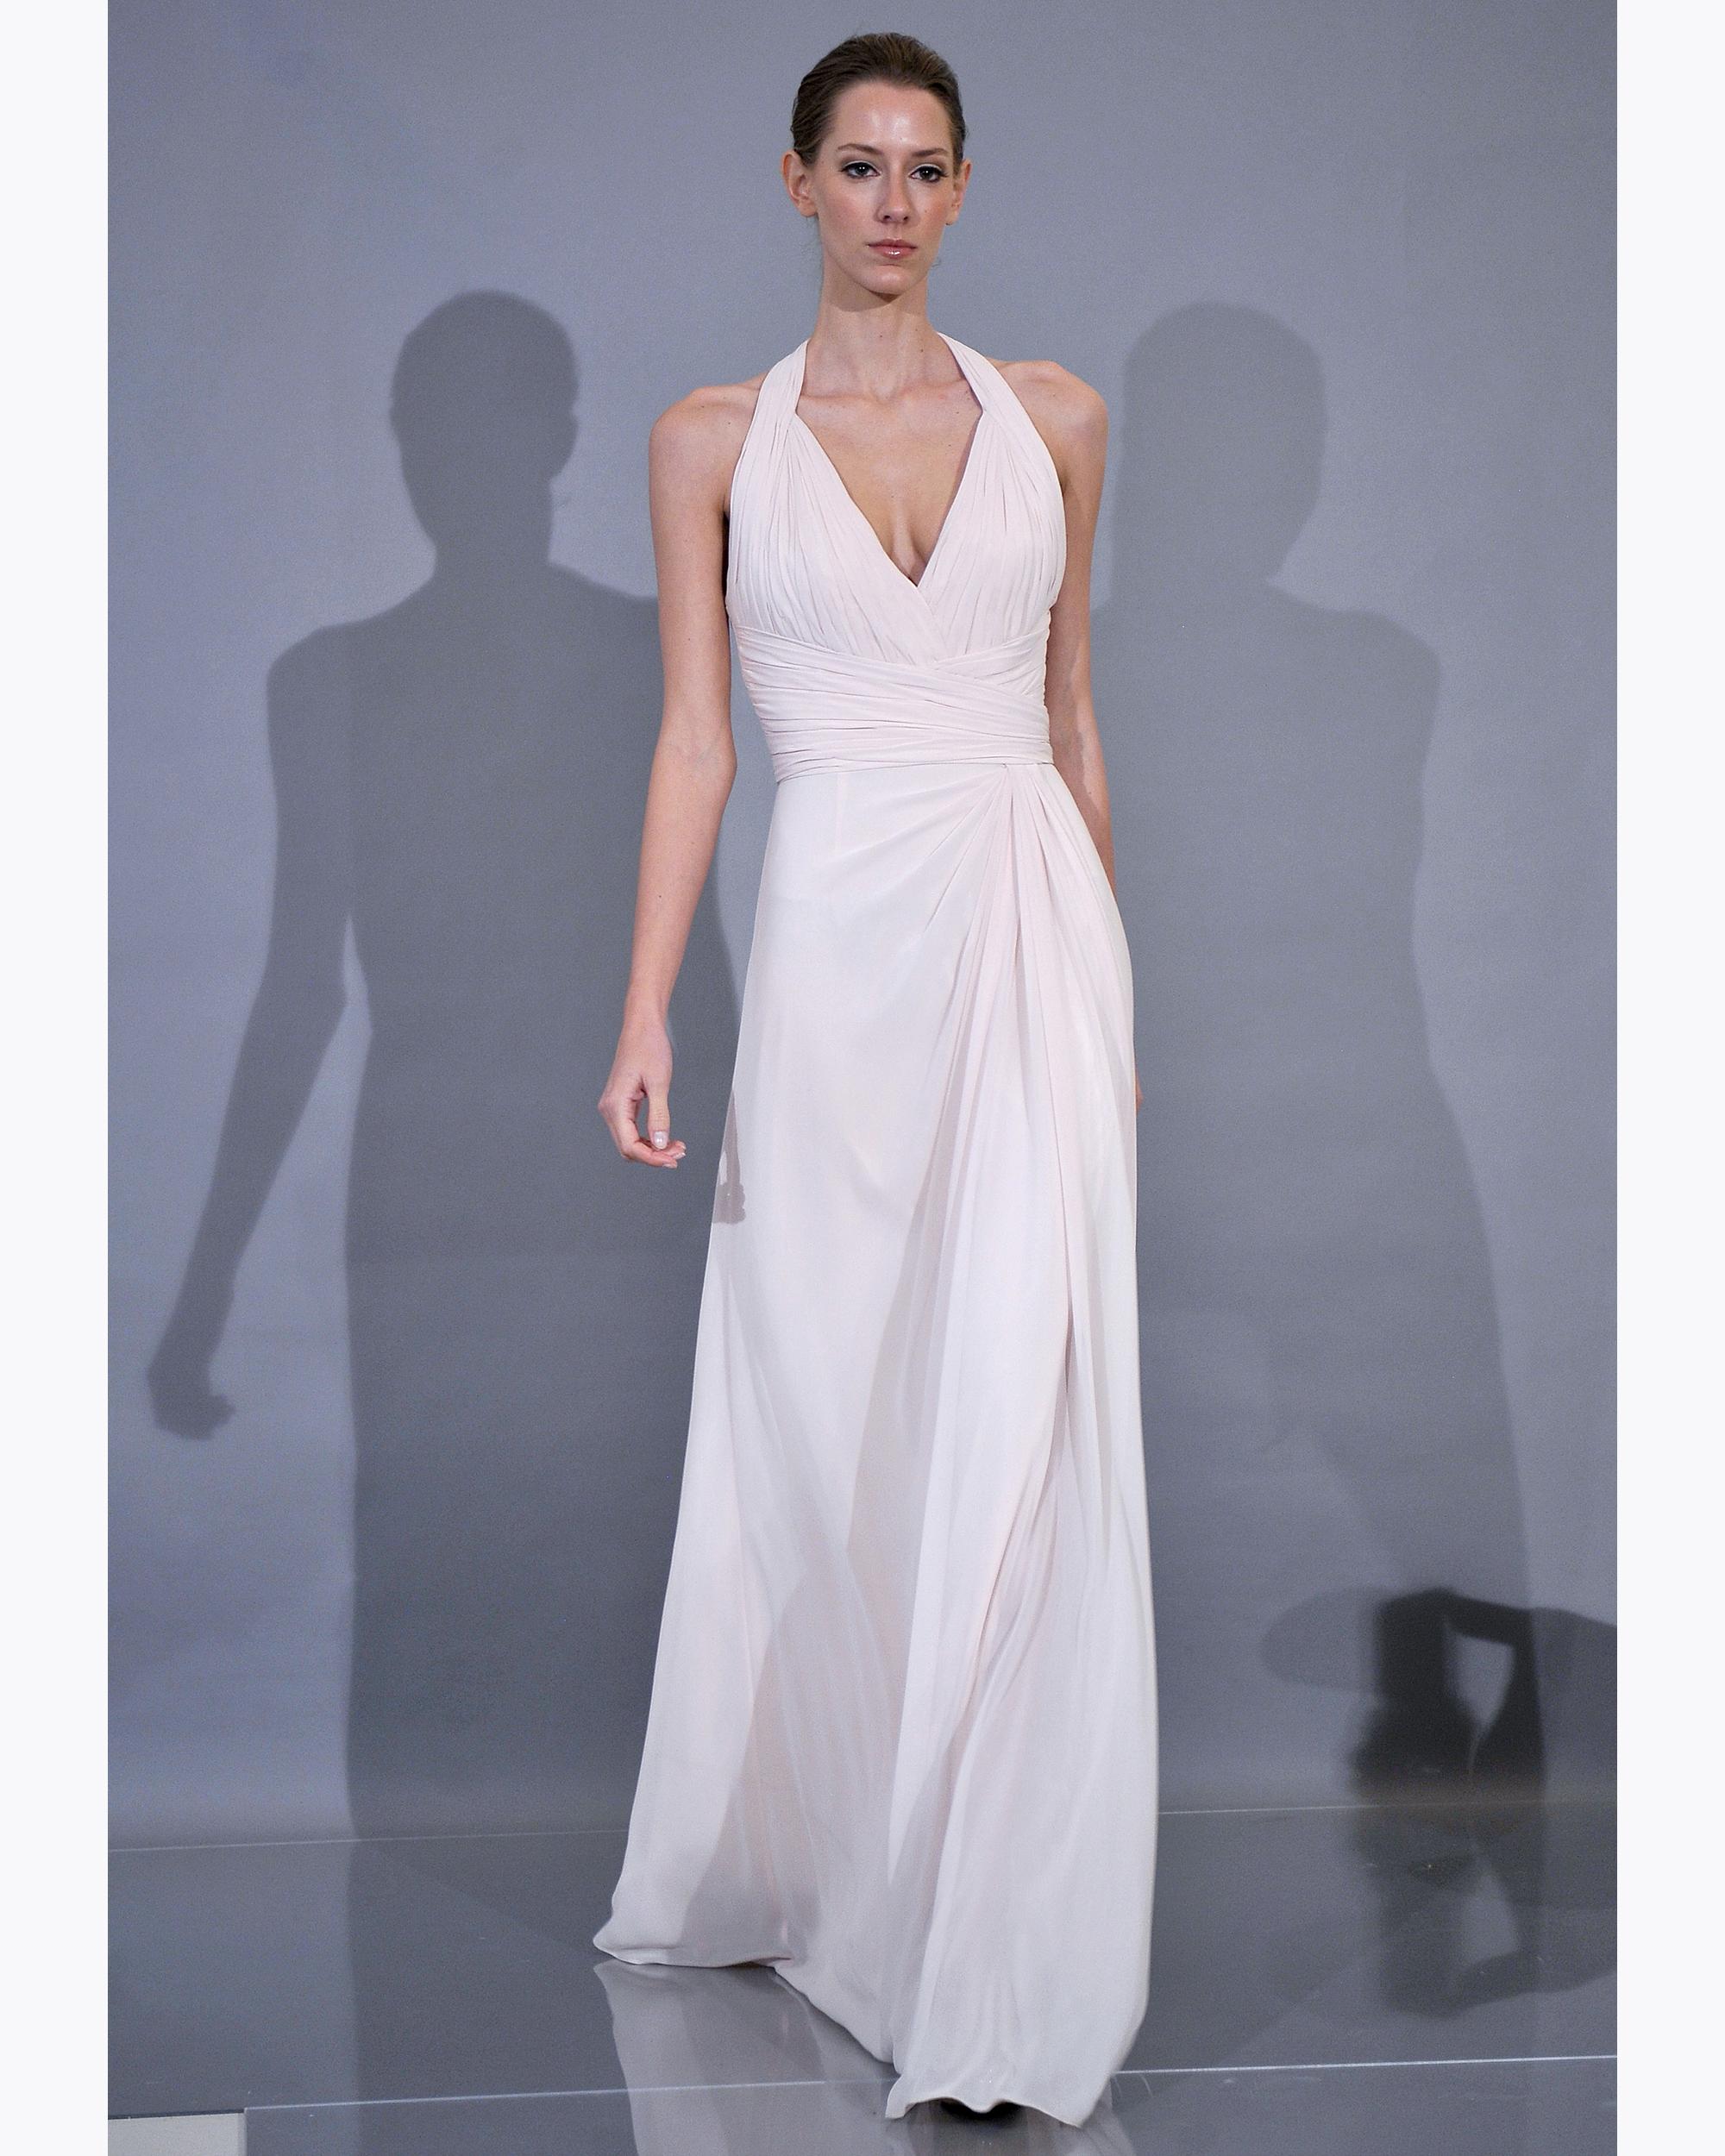 monique-lhuillier-bridesmaids-fall2012-wd108109-009.jpg